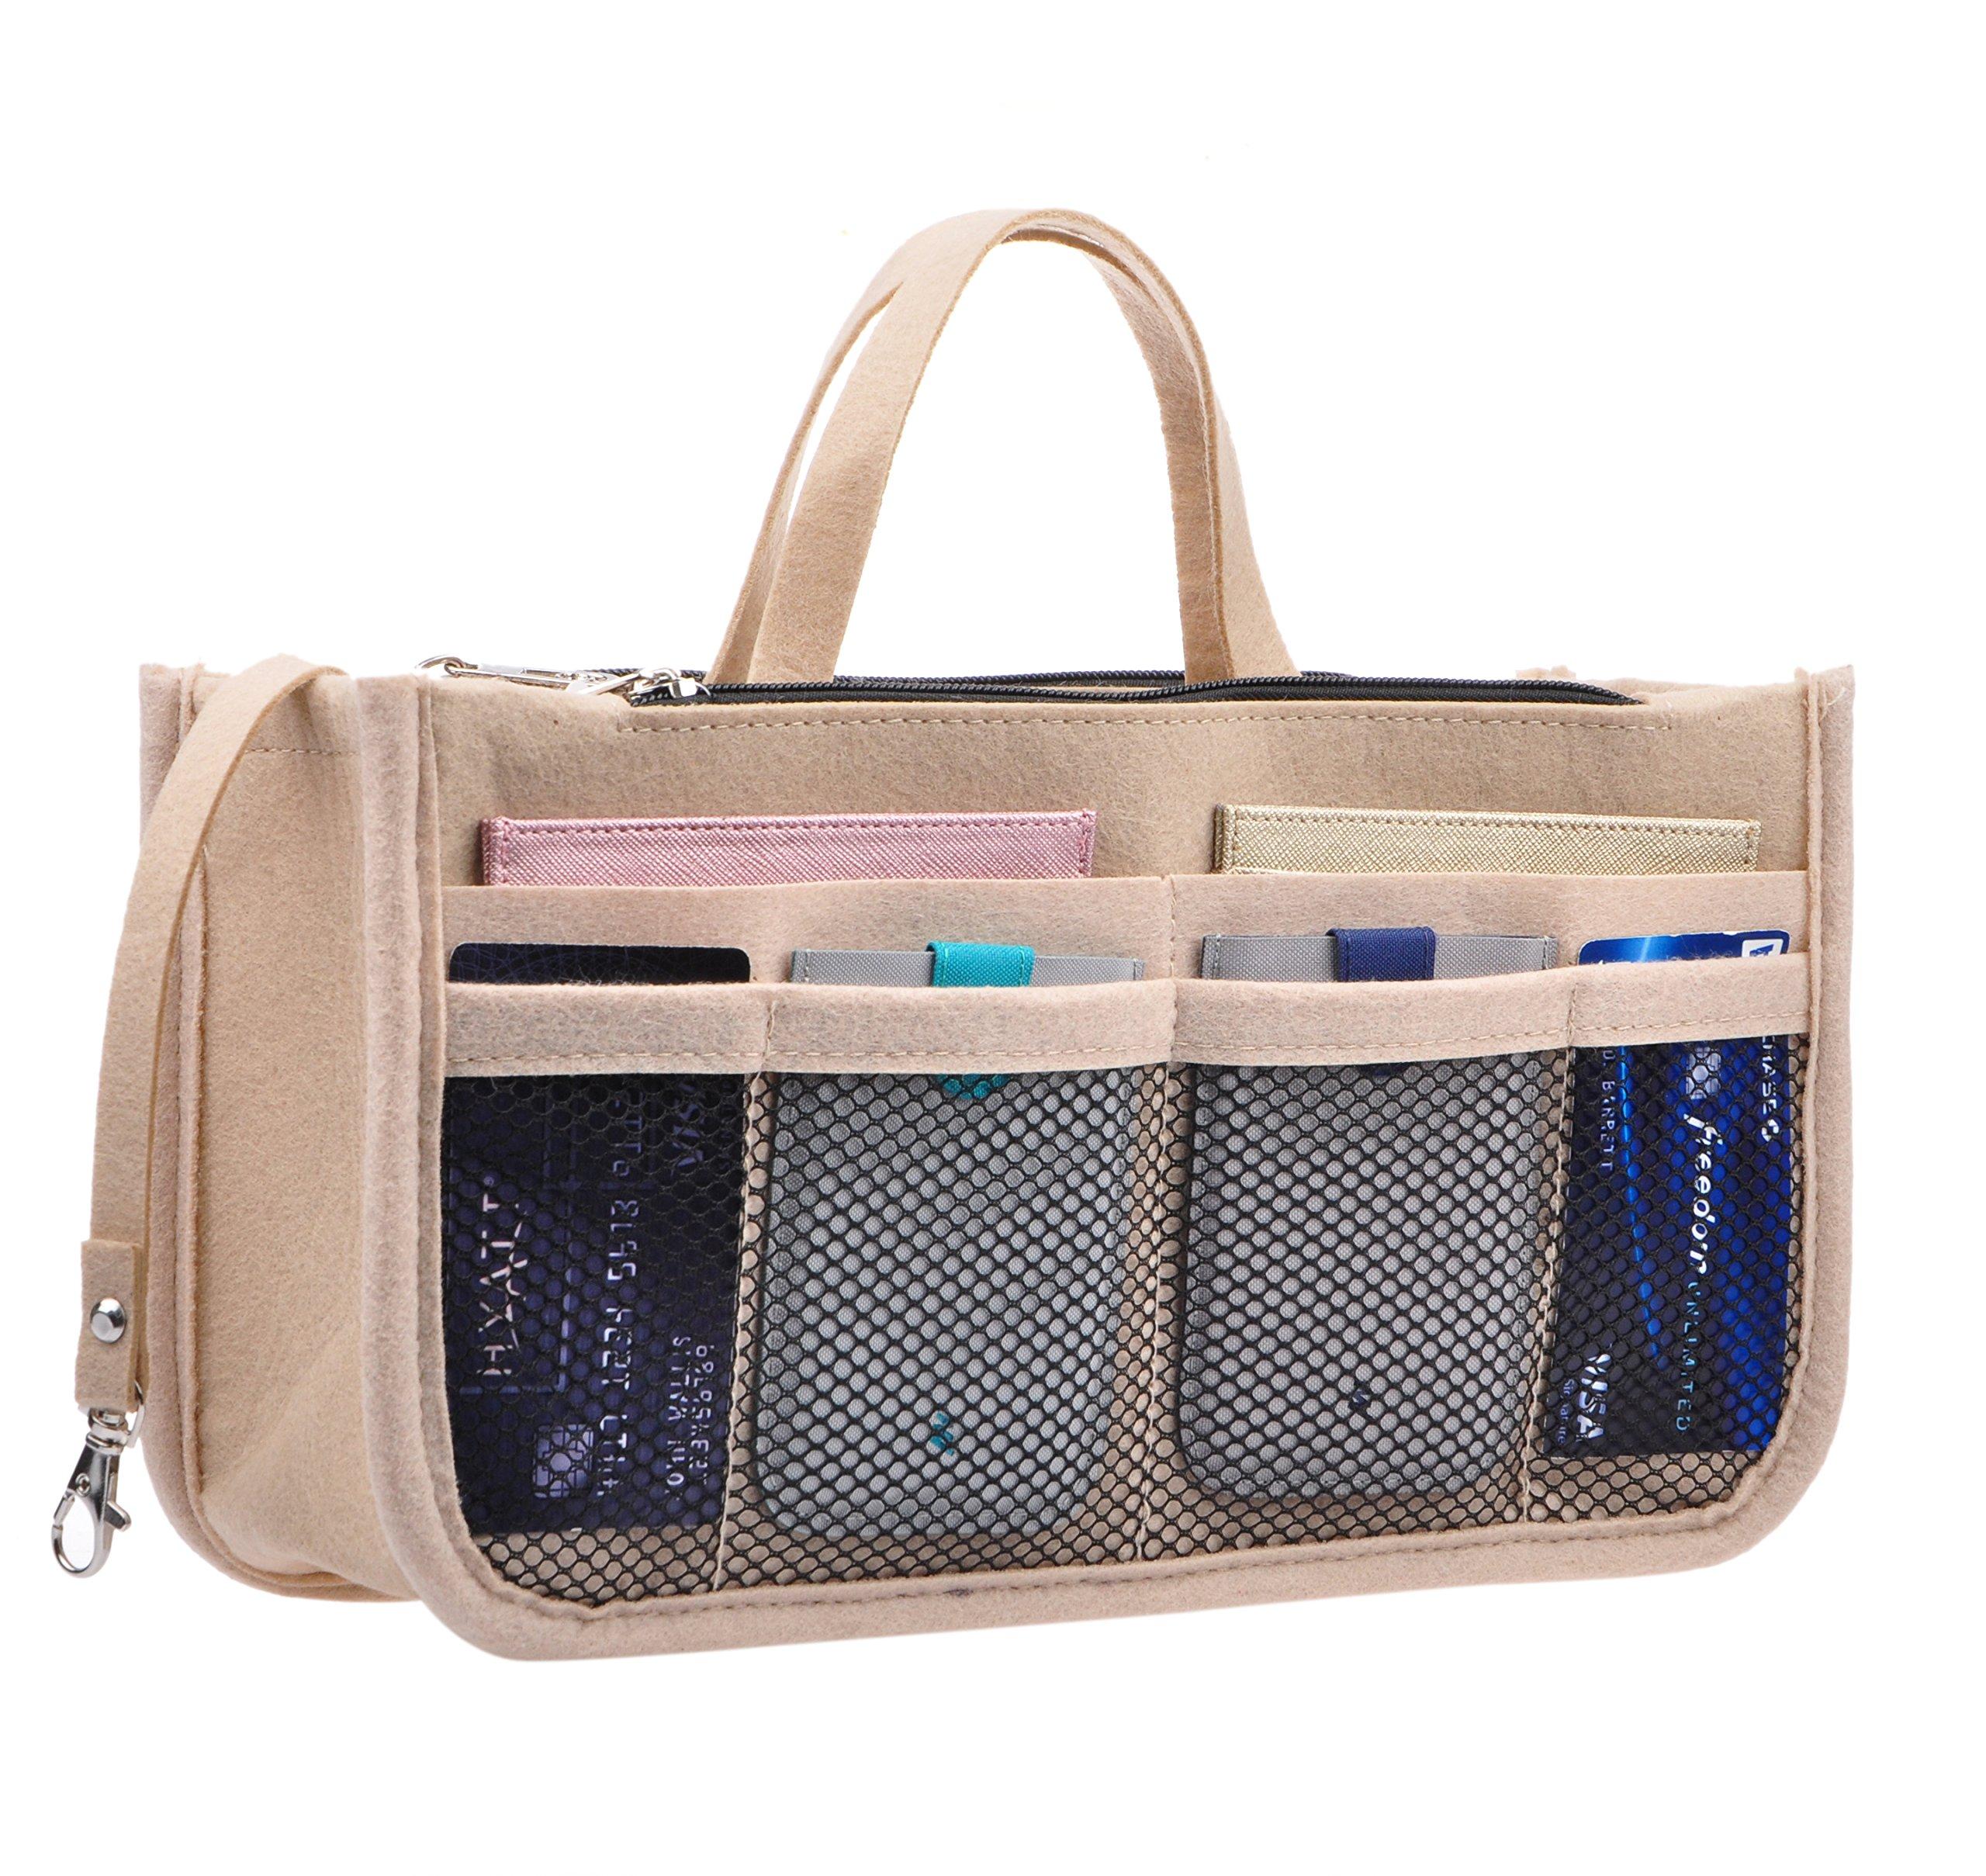 Vercord Sturdy Felt Handbag Purse Organizer Insert With Keychain 17 Compartments, Beige L